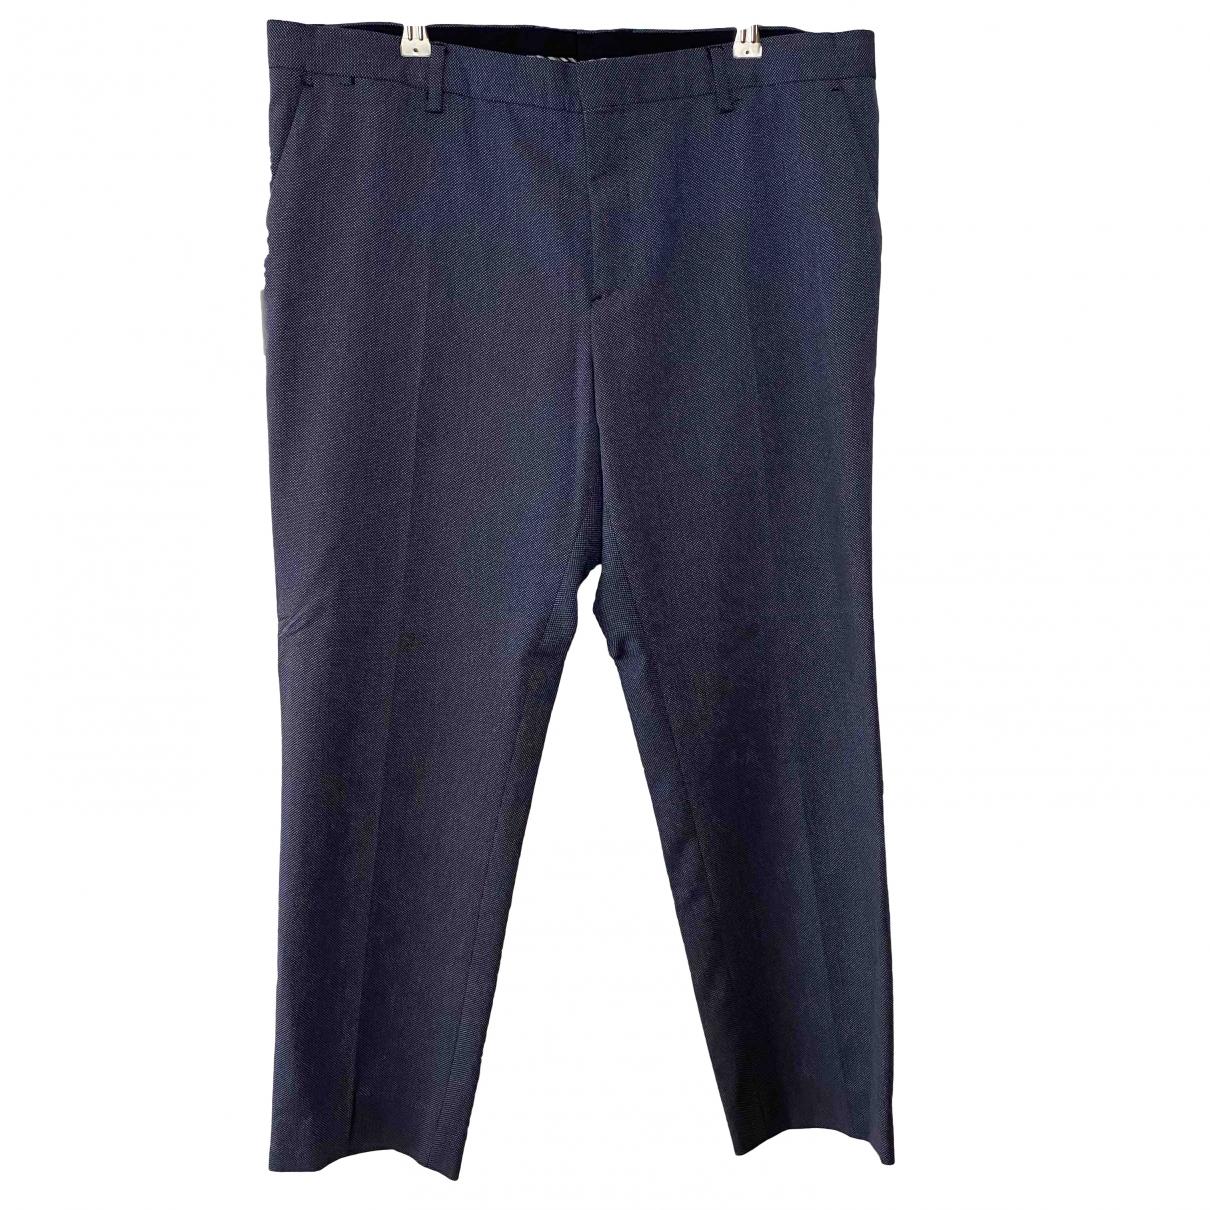 Zara \N Grey Cotton Trousers for Men 46 FR